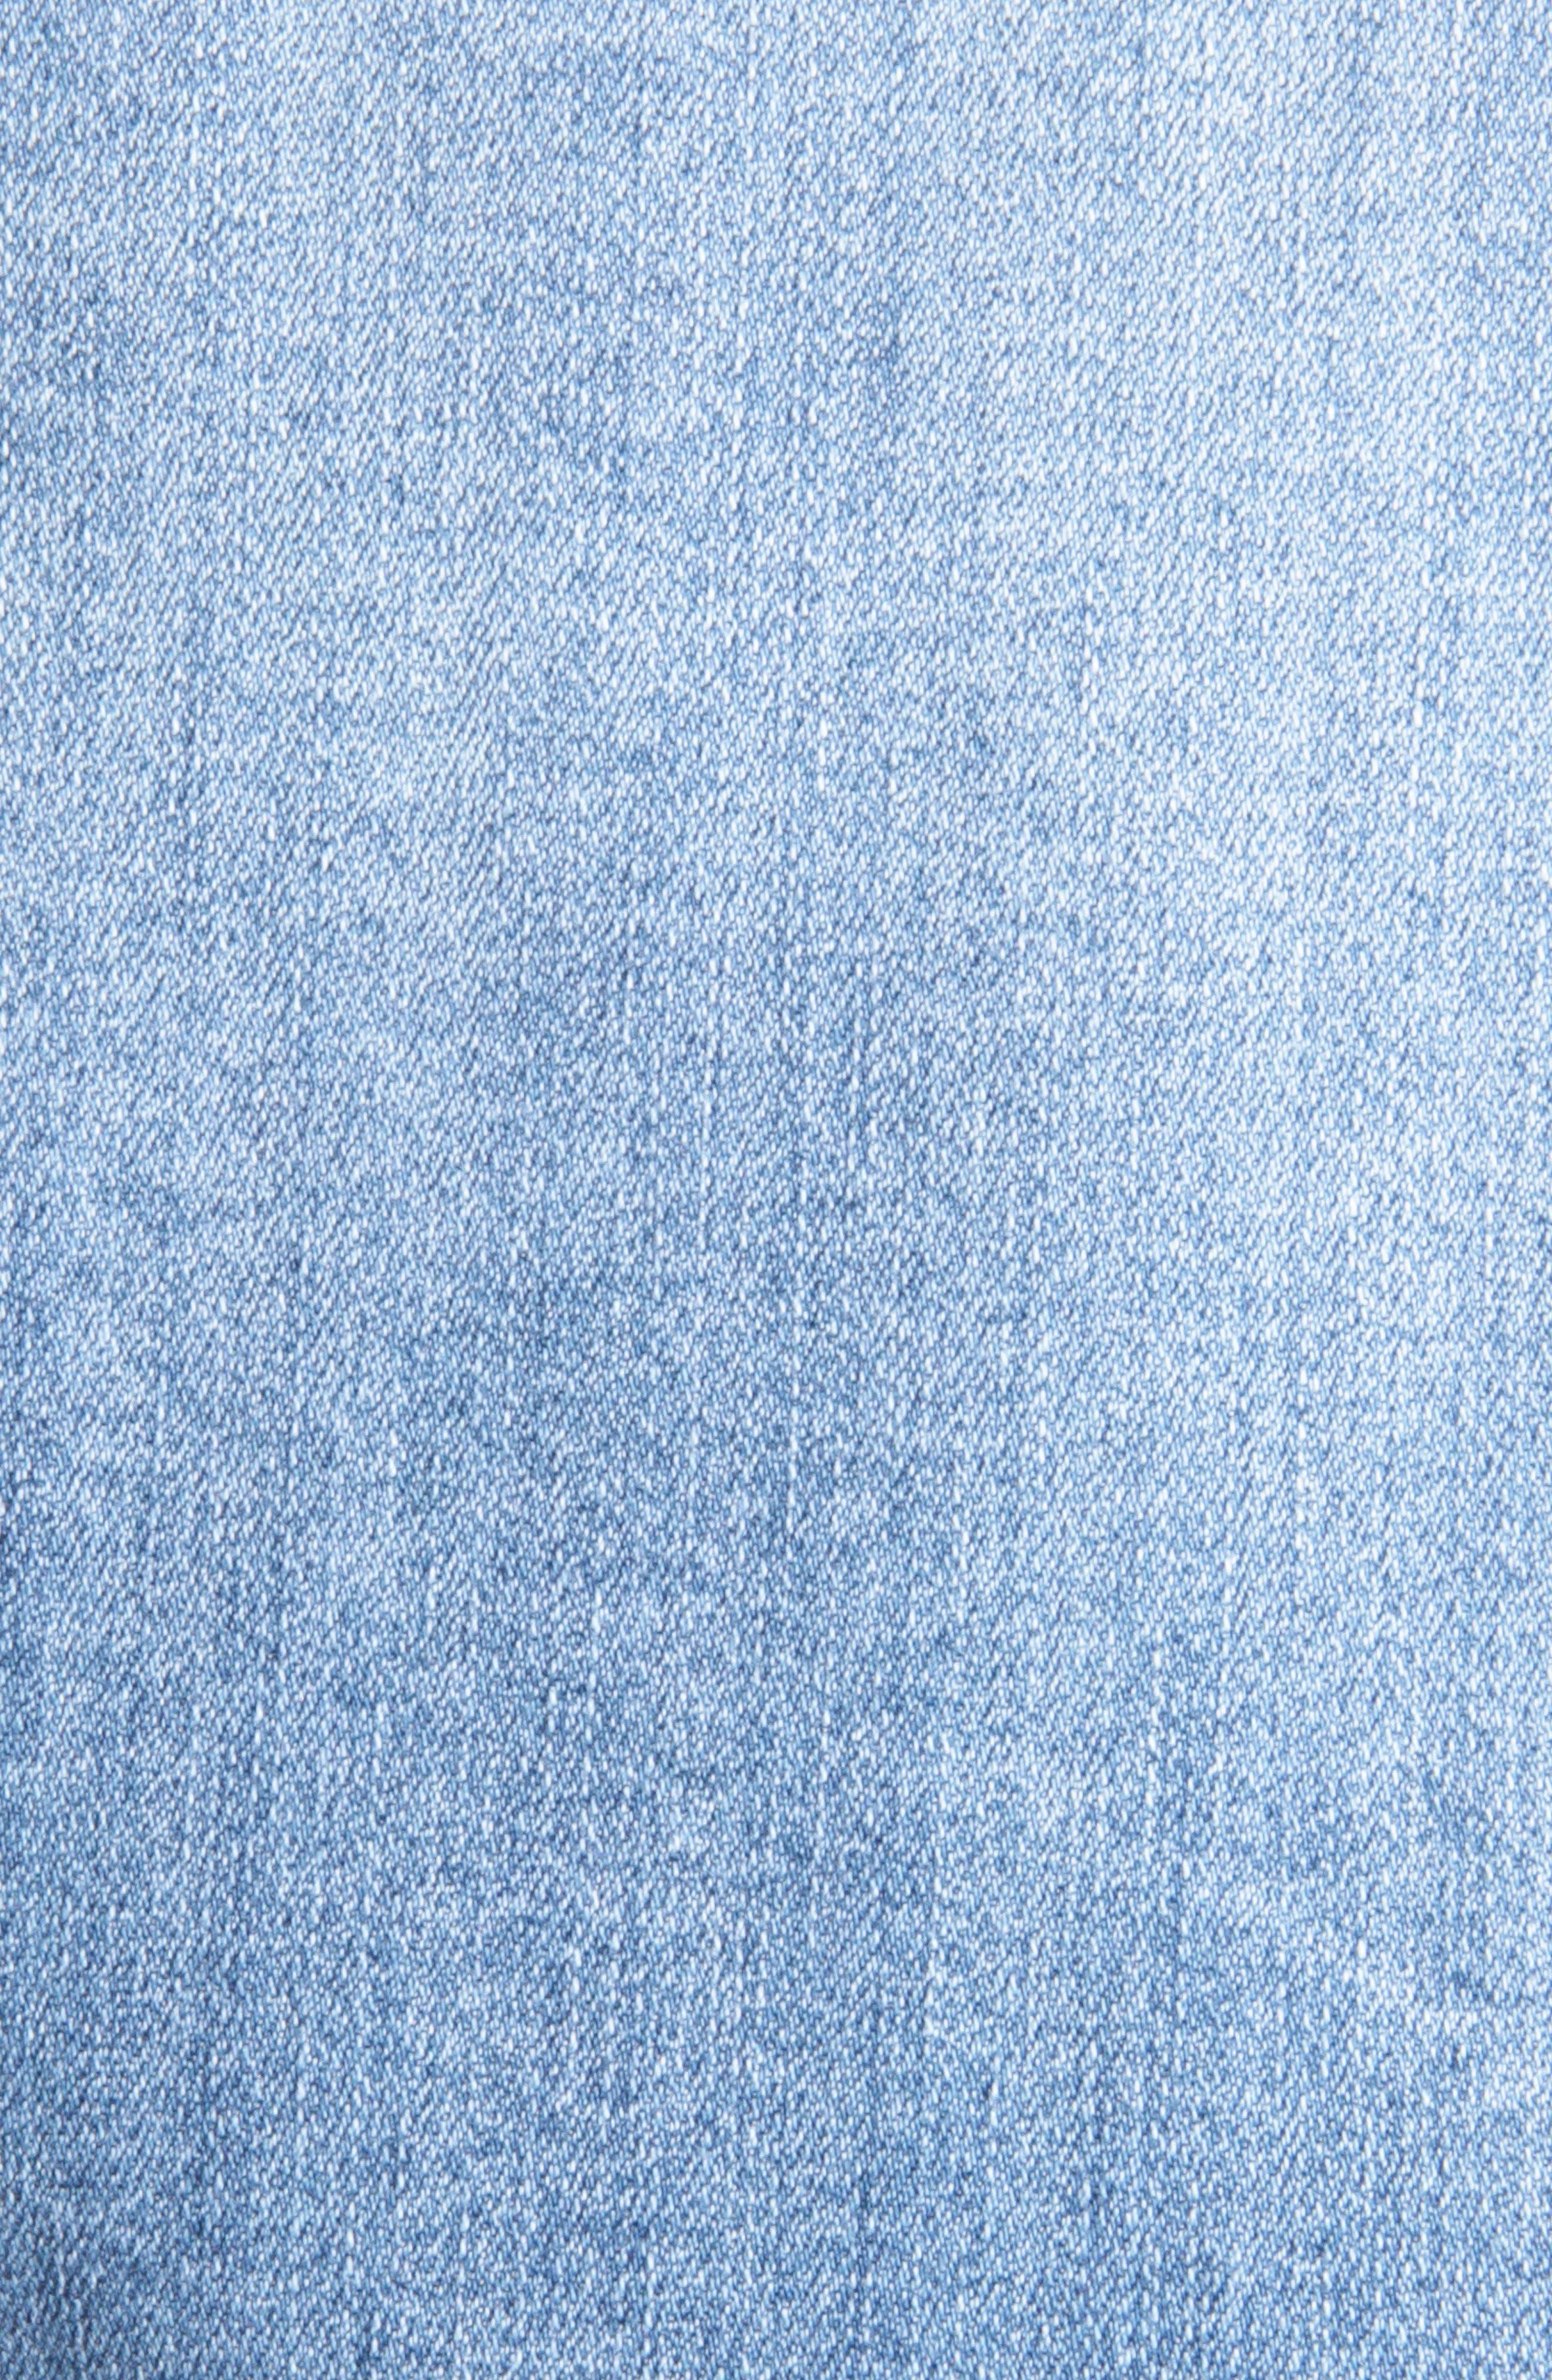 Alternate Image 4  - Kut from the Kloth Adriana Denim Jacket (Calculating)